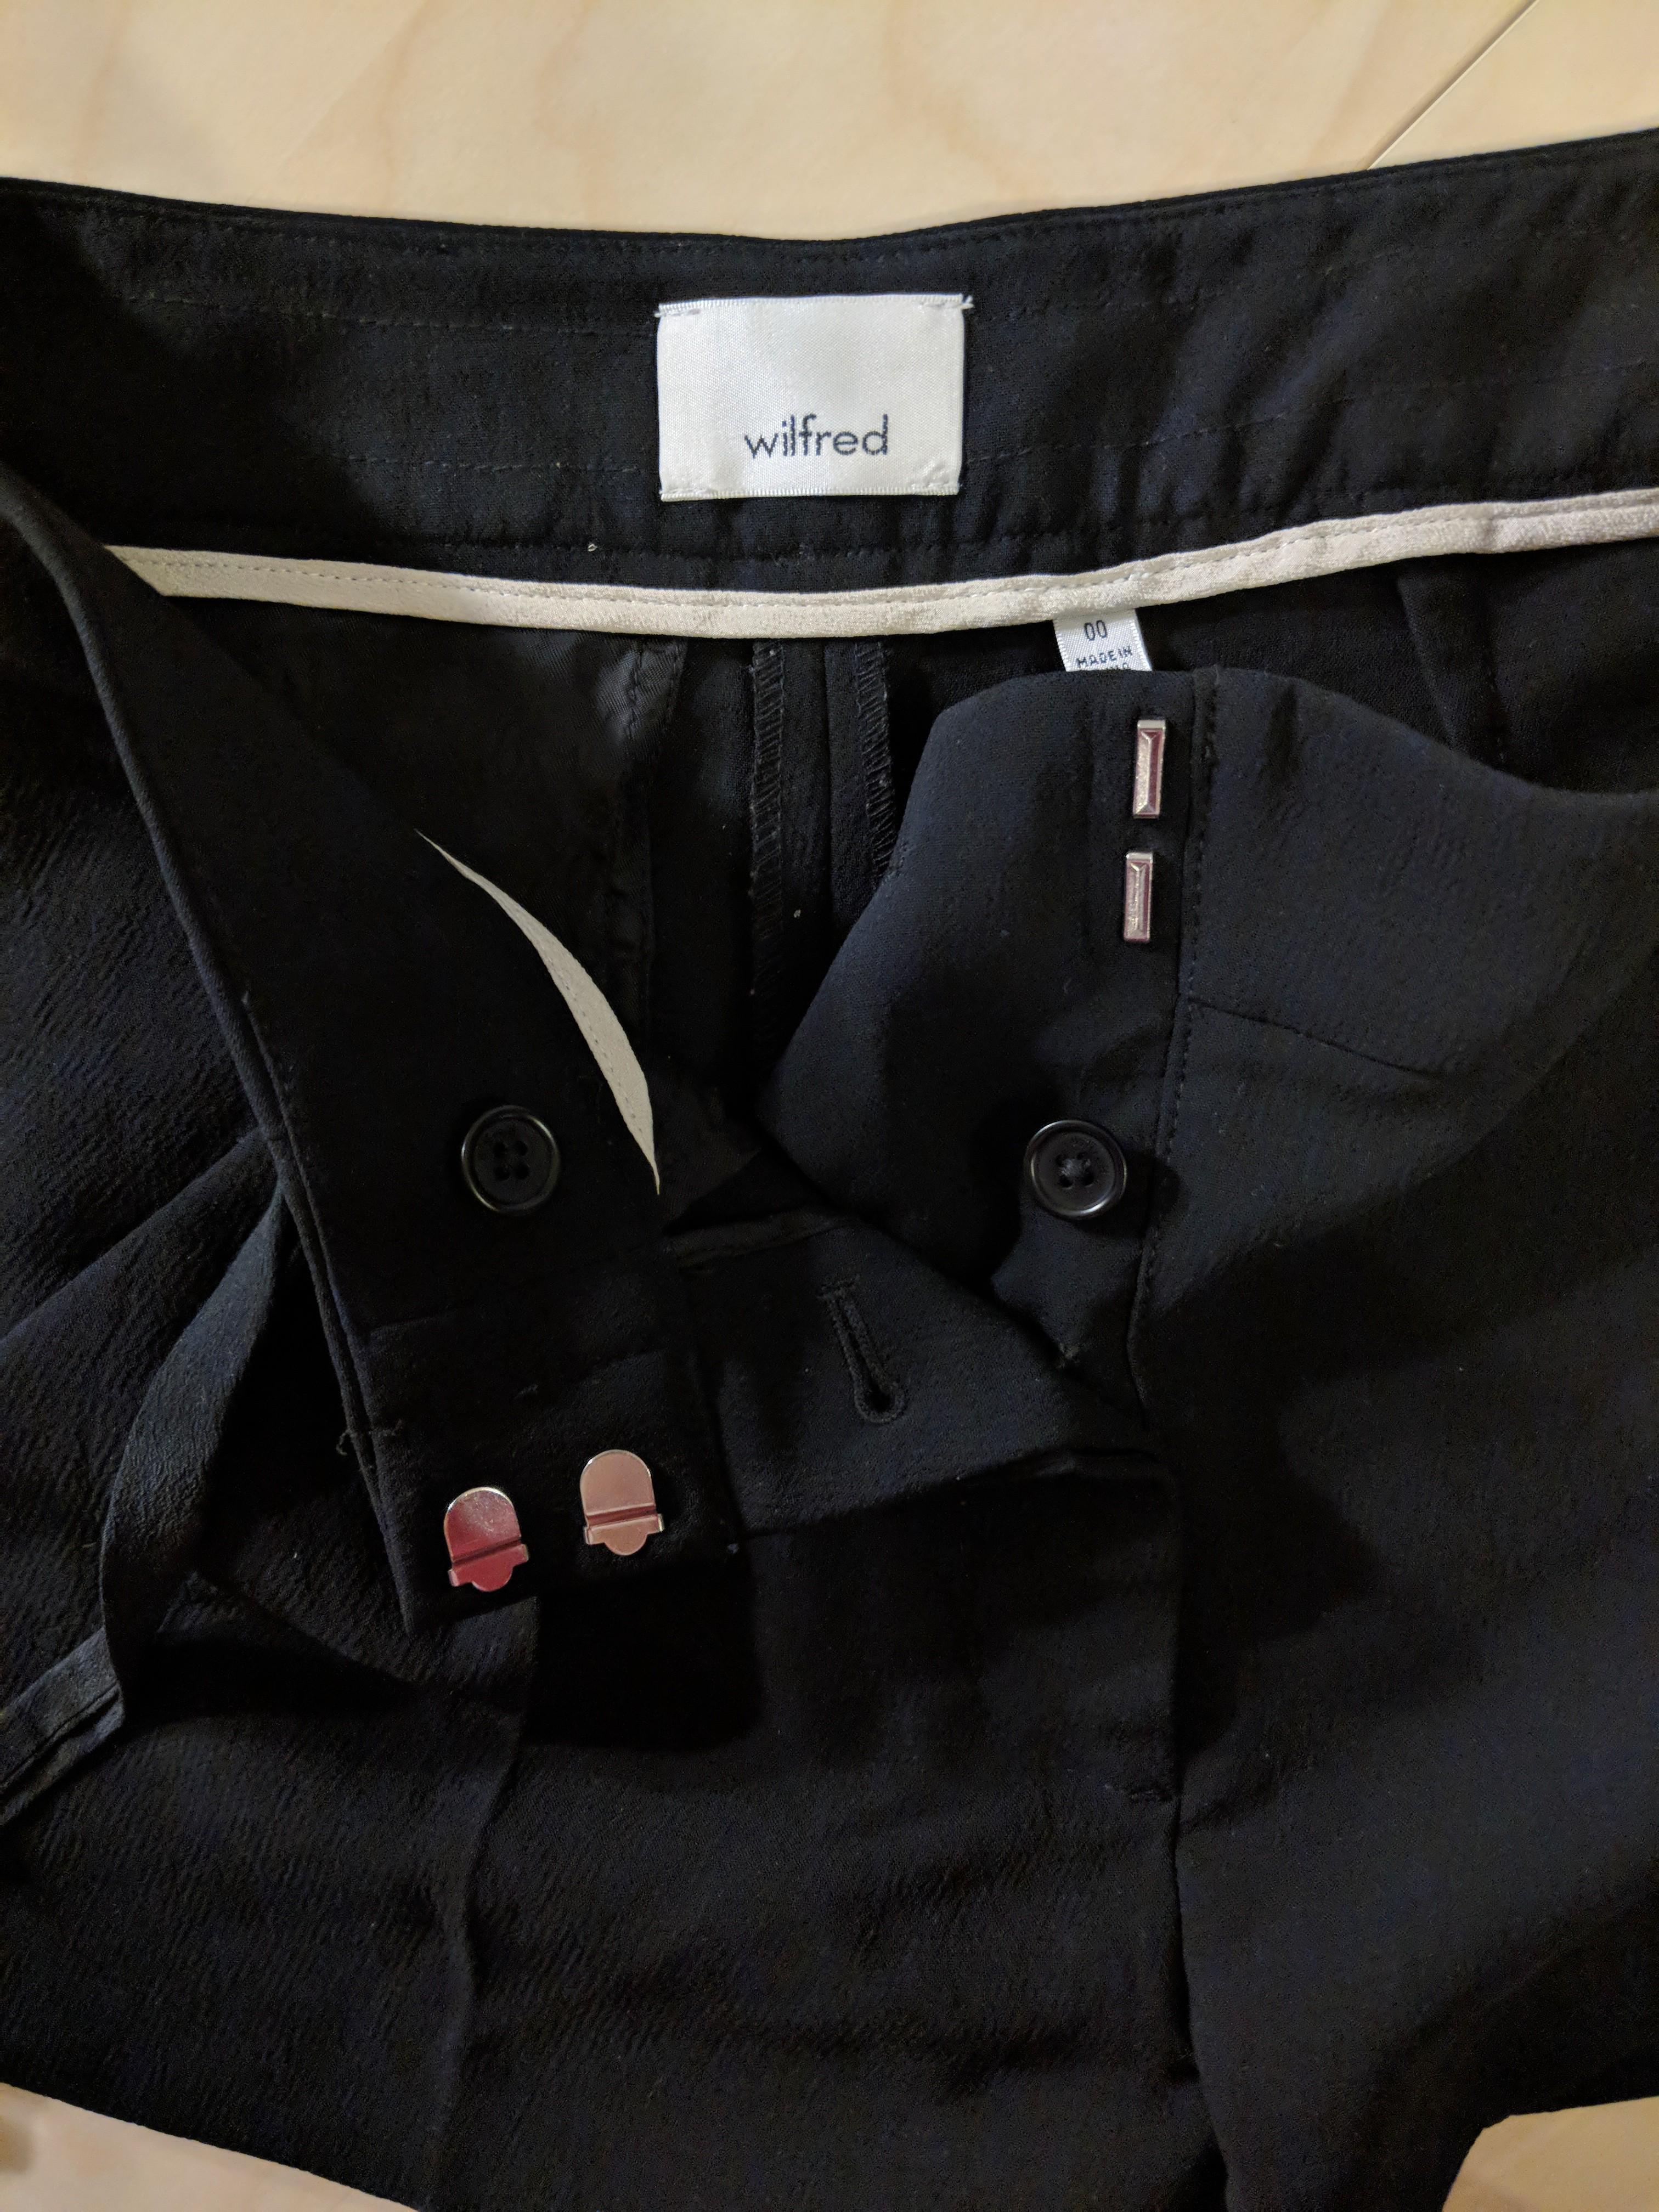 Aritzia Wilfred Shorts